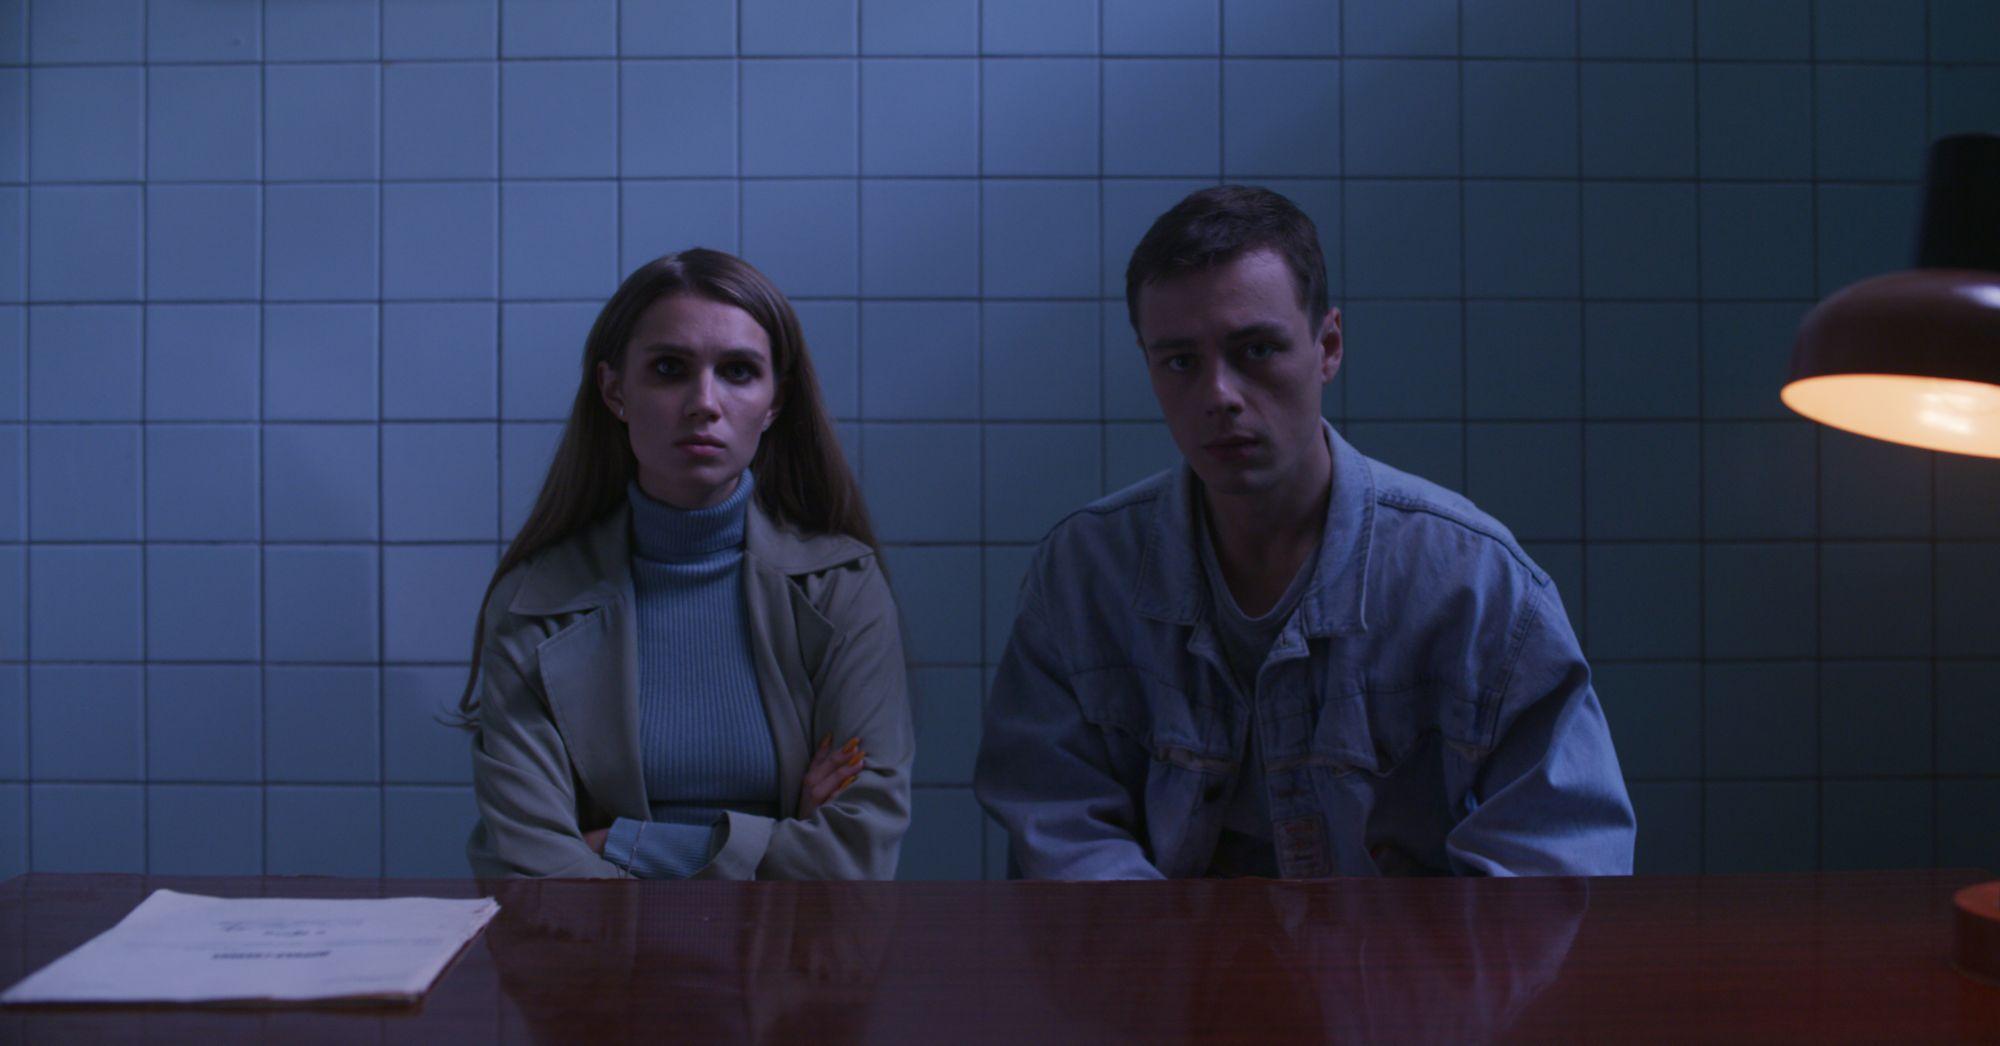 Завершены съемки хоррор-триллера «Синдром»